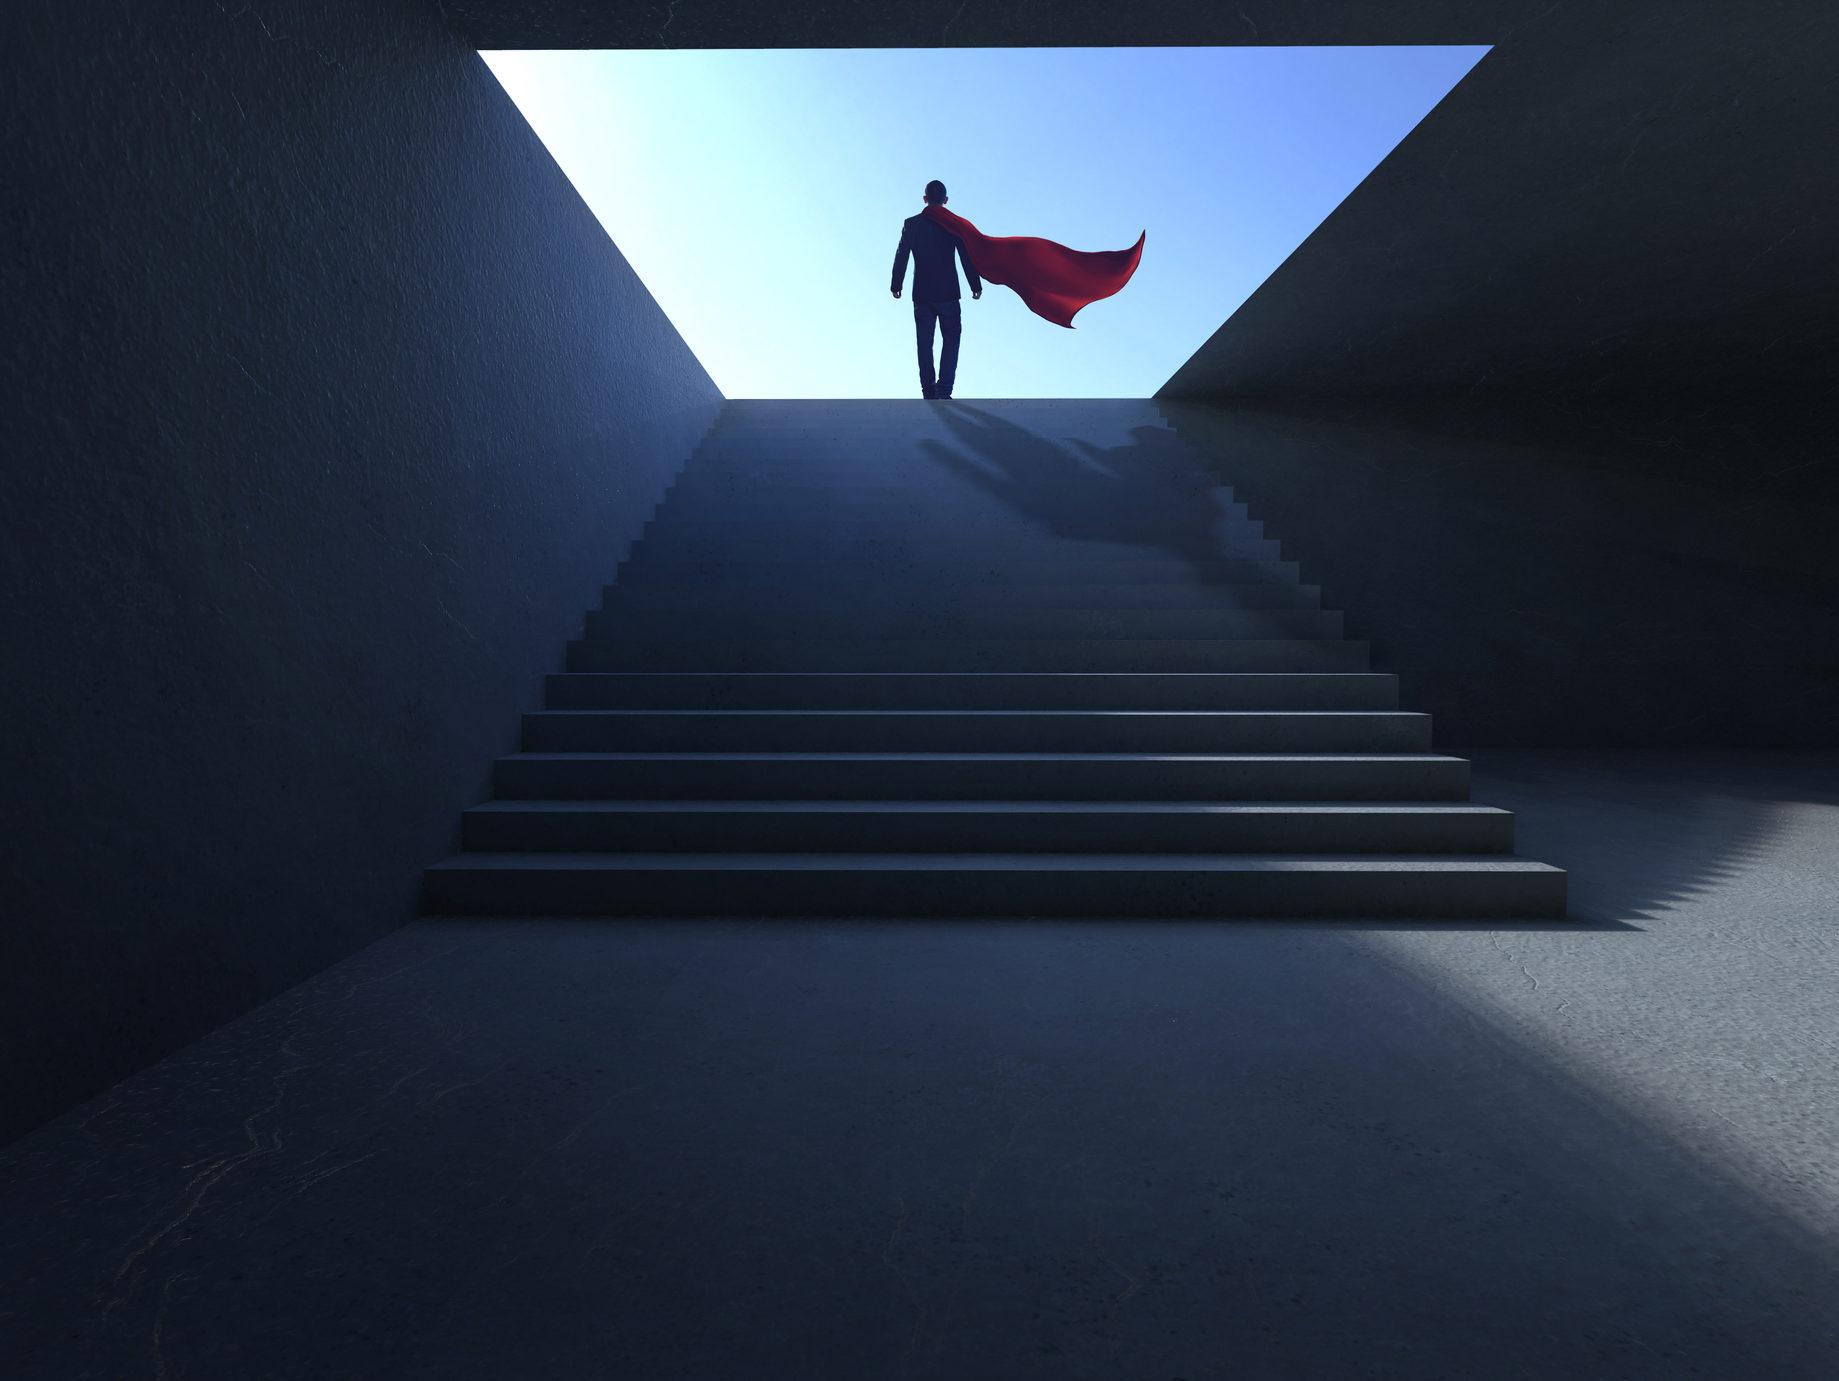 Belizaire, ceoplaybook, superpowers